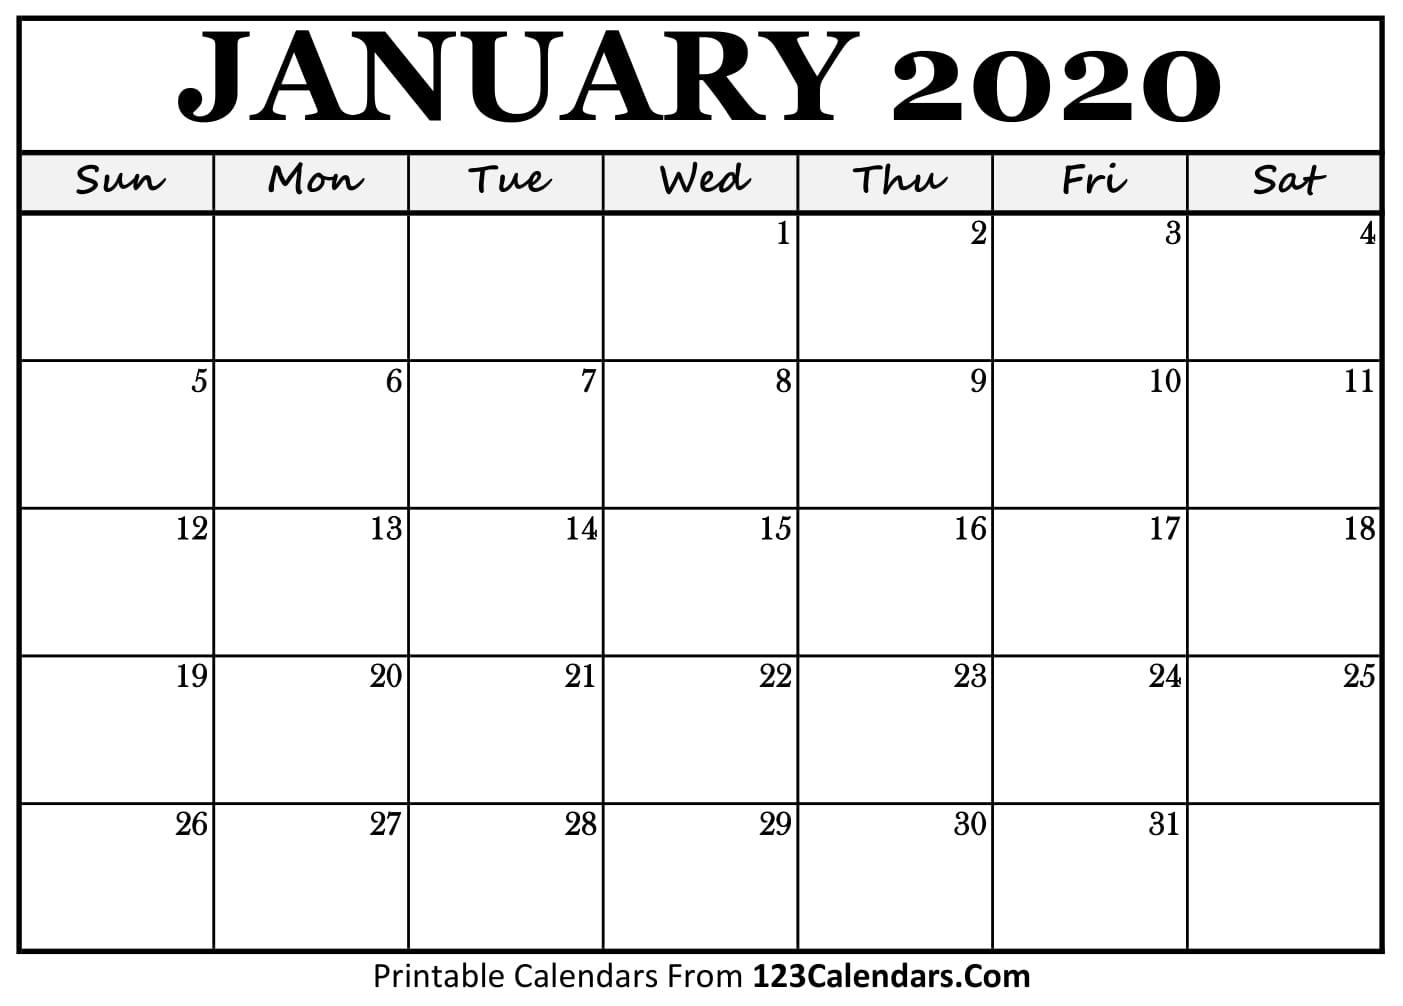 Blank Calendar 2020 Printable | Free Printable Calendar with regard to Free Blank Printable Monthly Calendar 2020